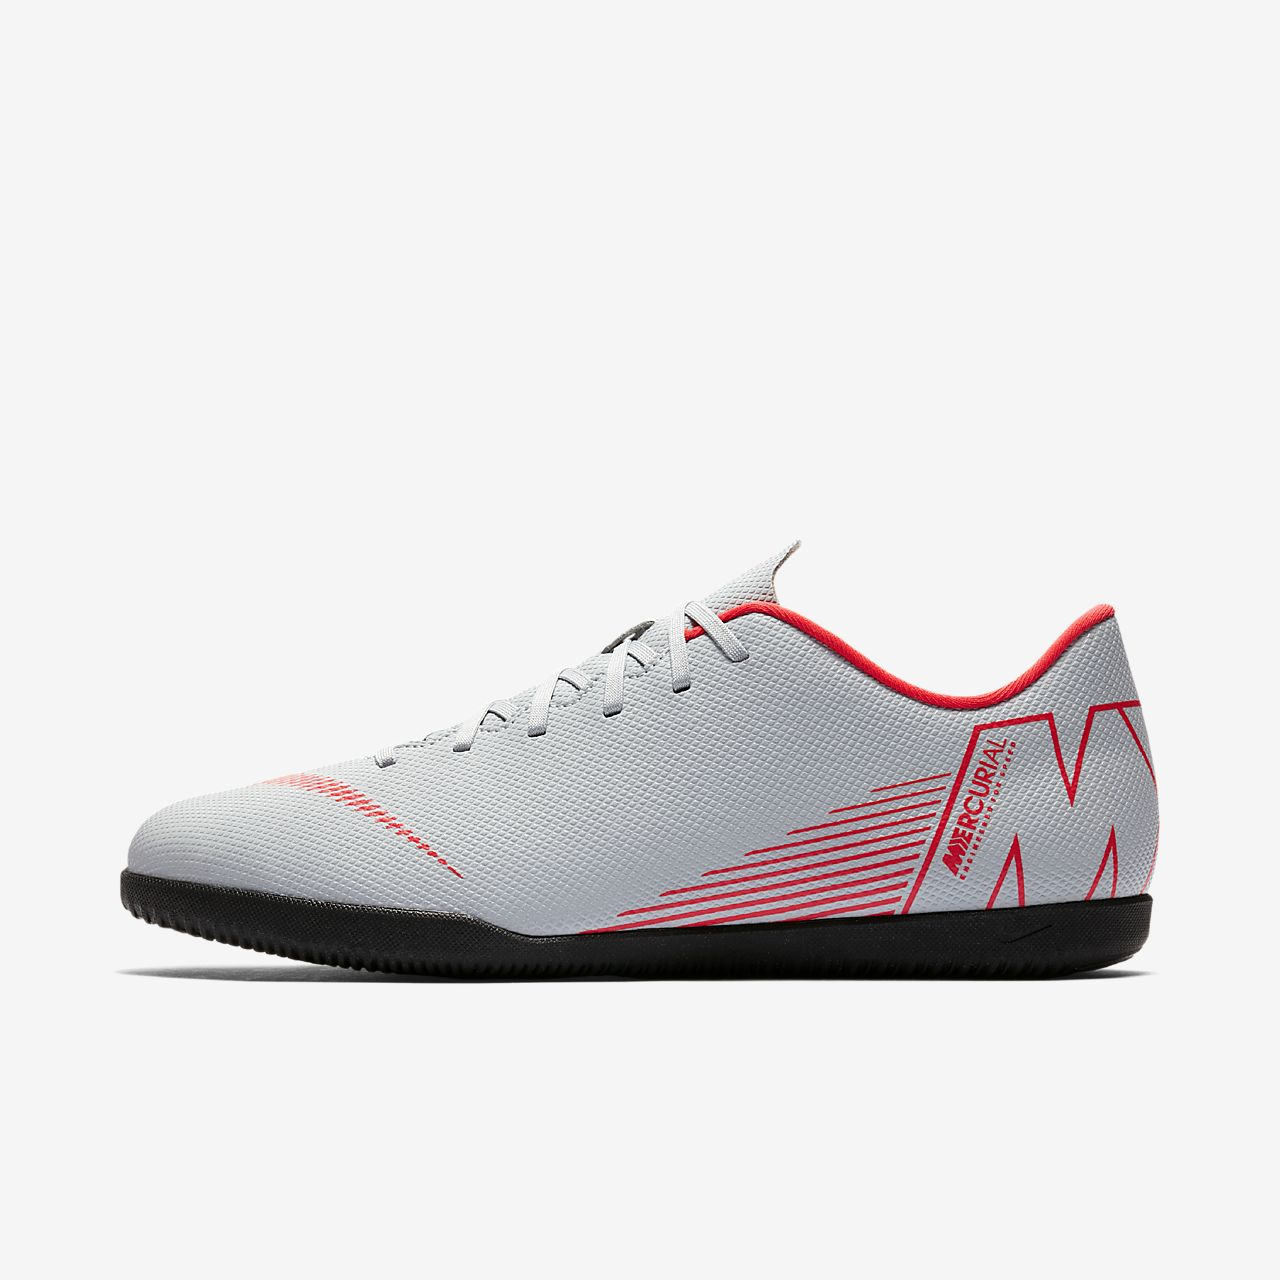 cheaper 8e7b1 885ad ... sort hvid hot lava antracit online sa  nike mercurialx vapor xii club  ic fodboldsko (indendørs bane)